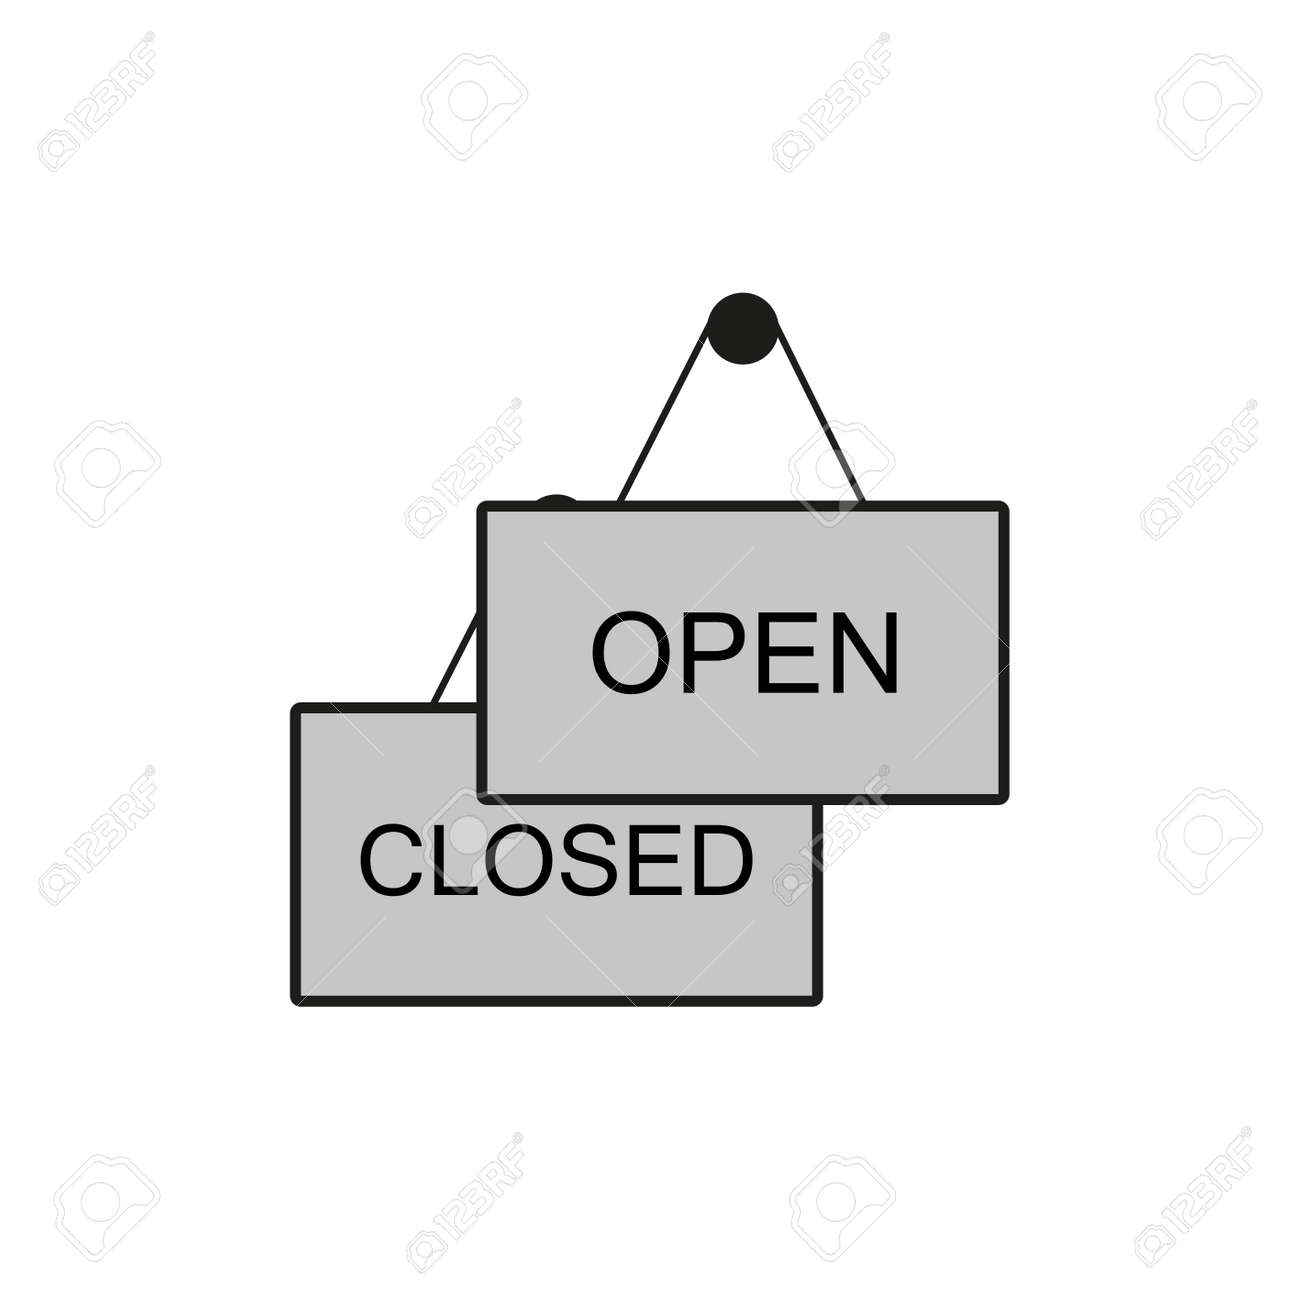 plate open closed icon - 140456274